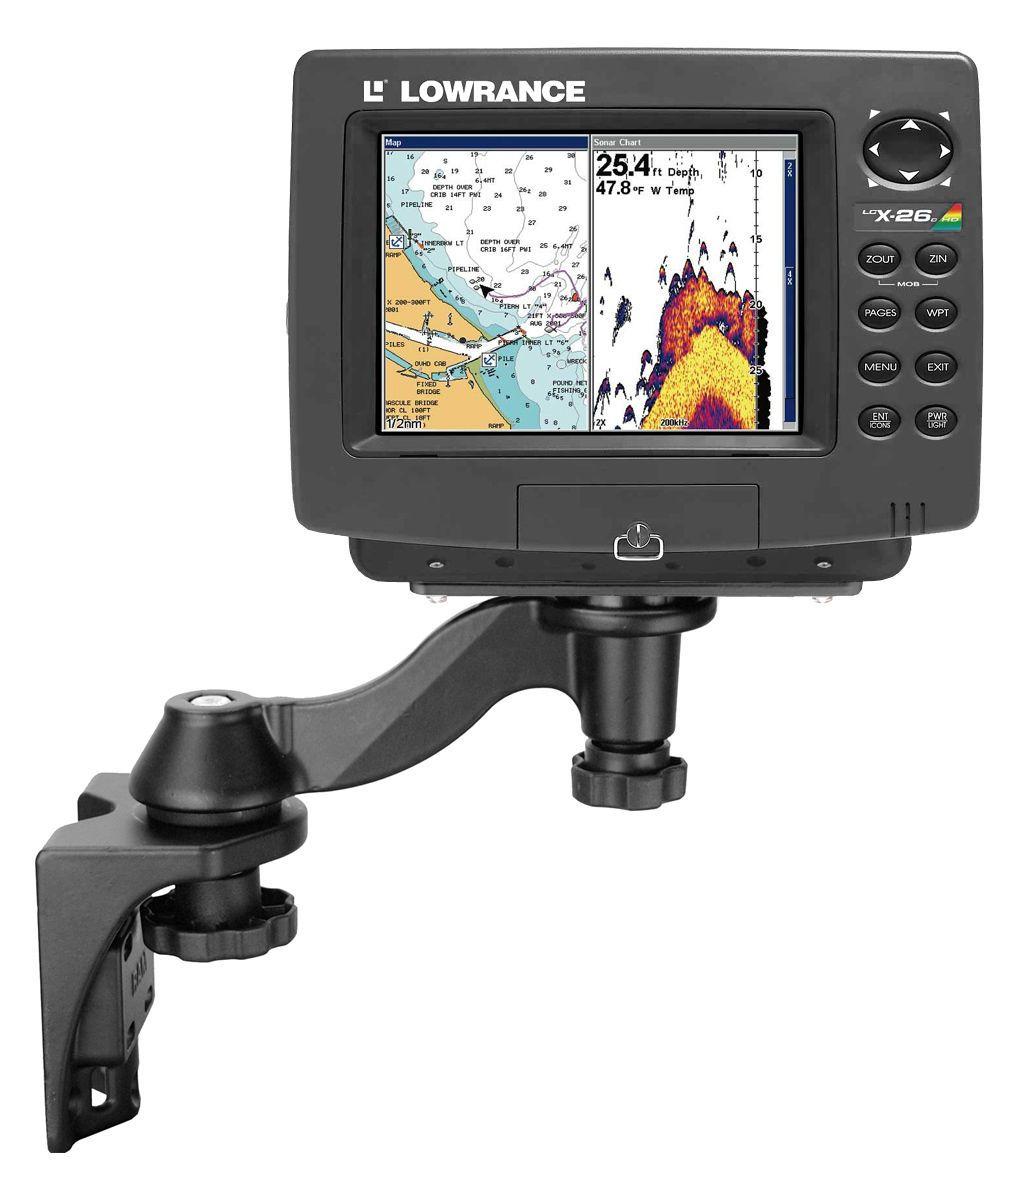 Lowrance Fish Finder Mounts | Gps mounts, Waterproof phone ...